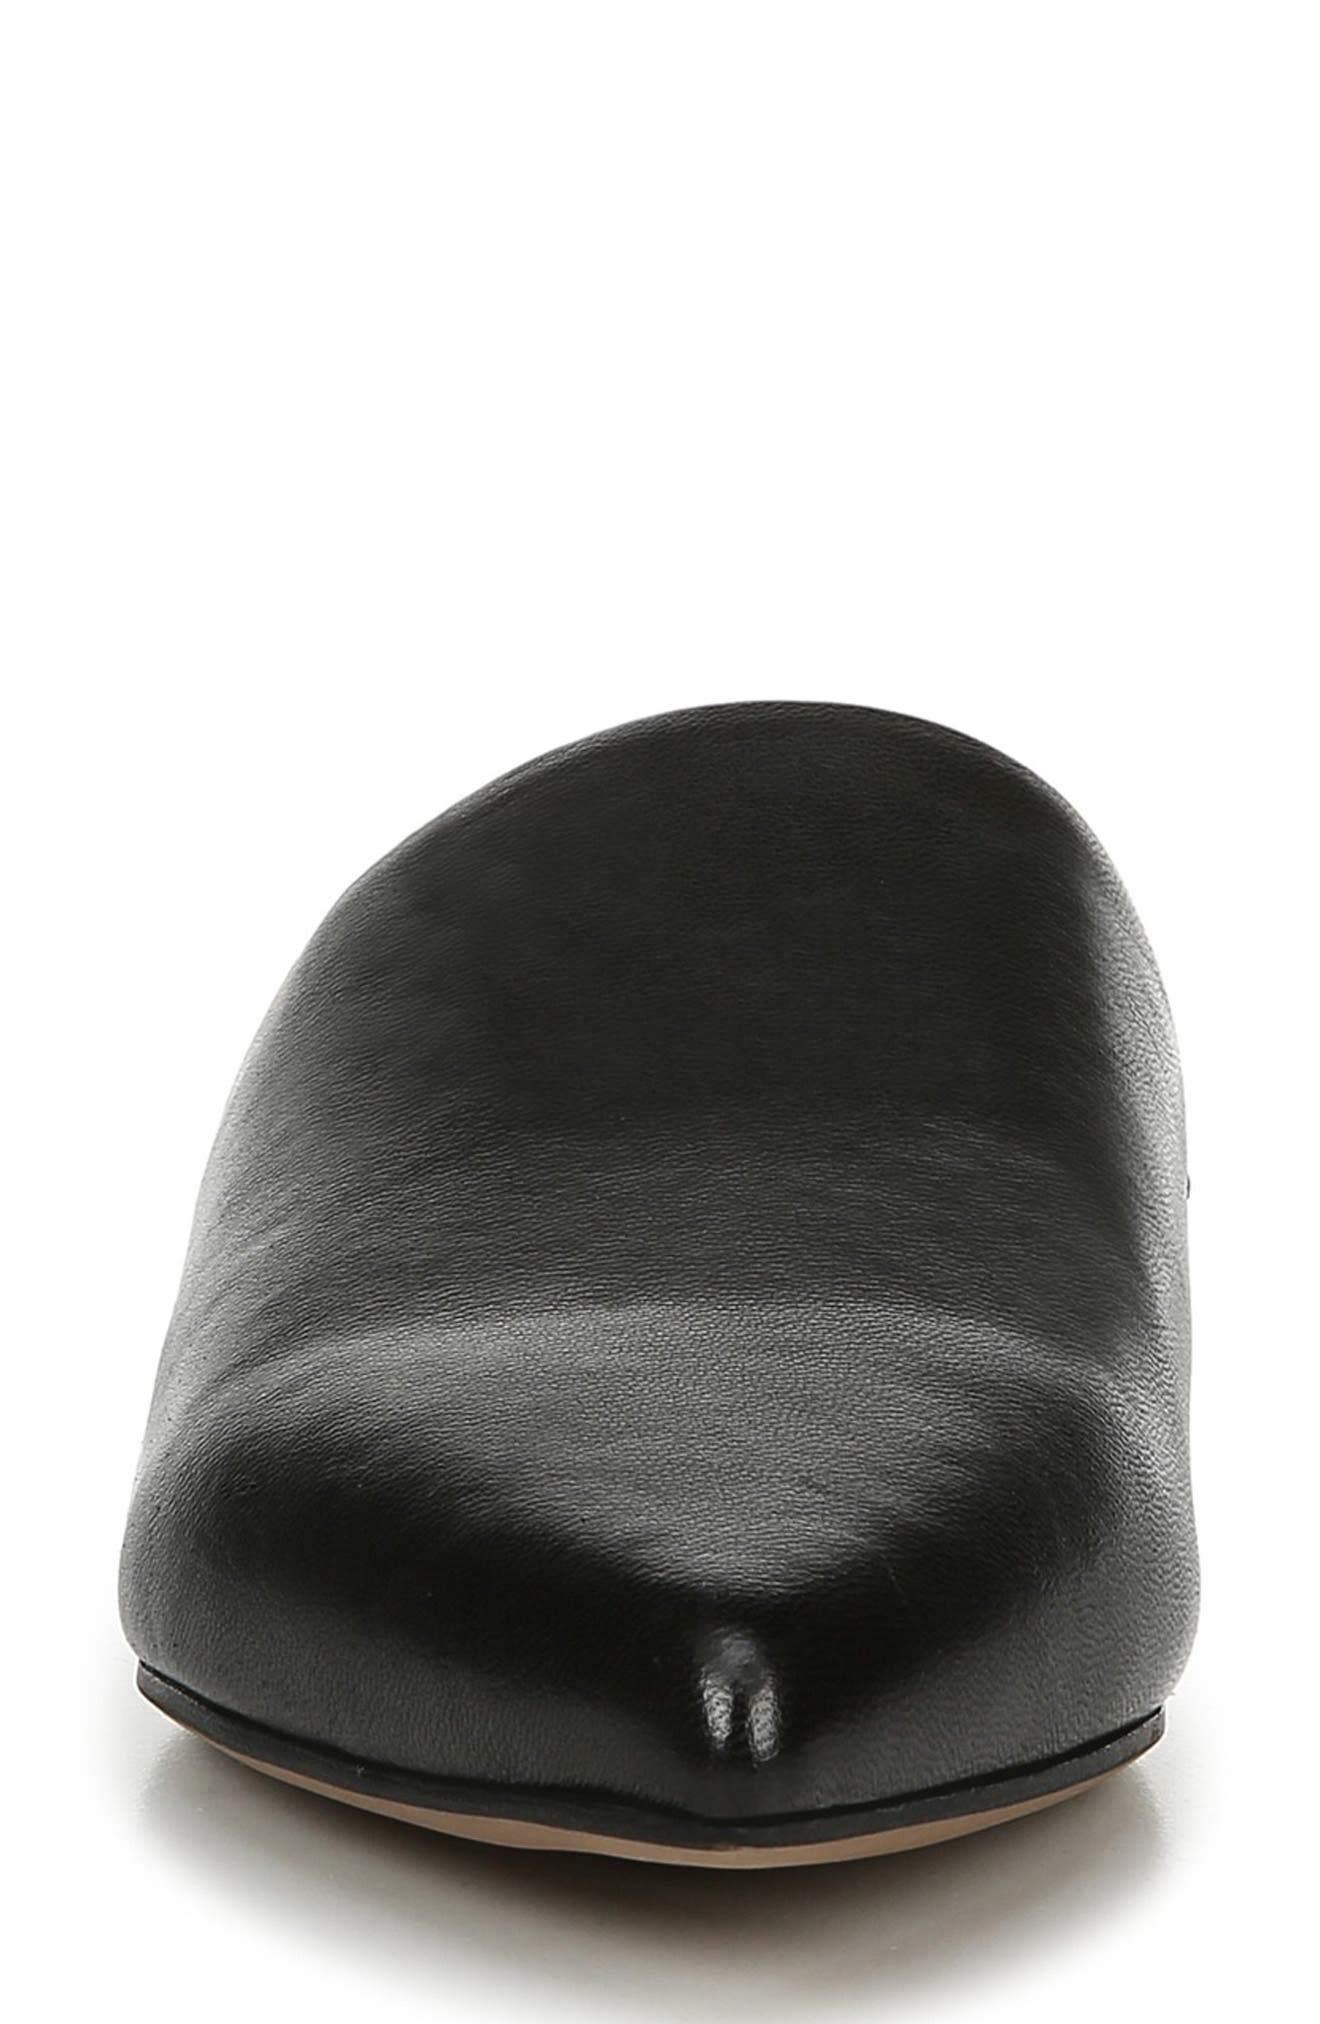 SARTO BY FRANCO SARTO,                             Irma Pointy Toe Mule,                             Alternate thumbnail 4, color,                             BLACK LEATHER